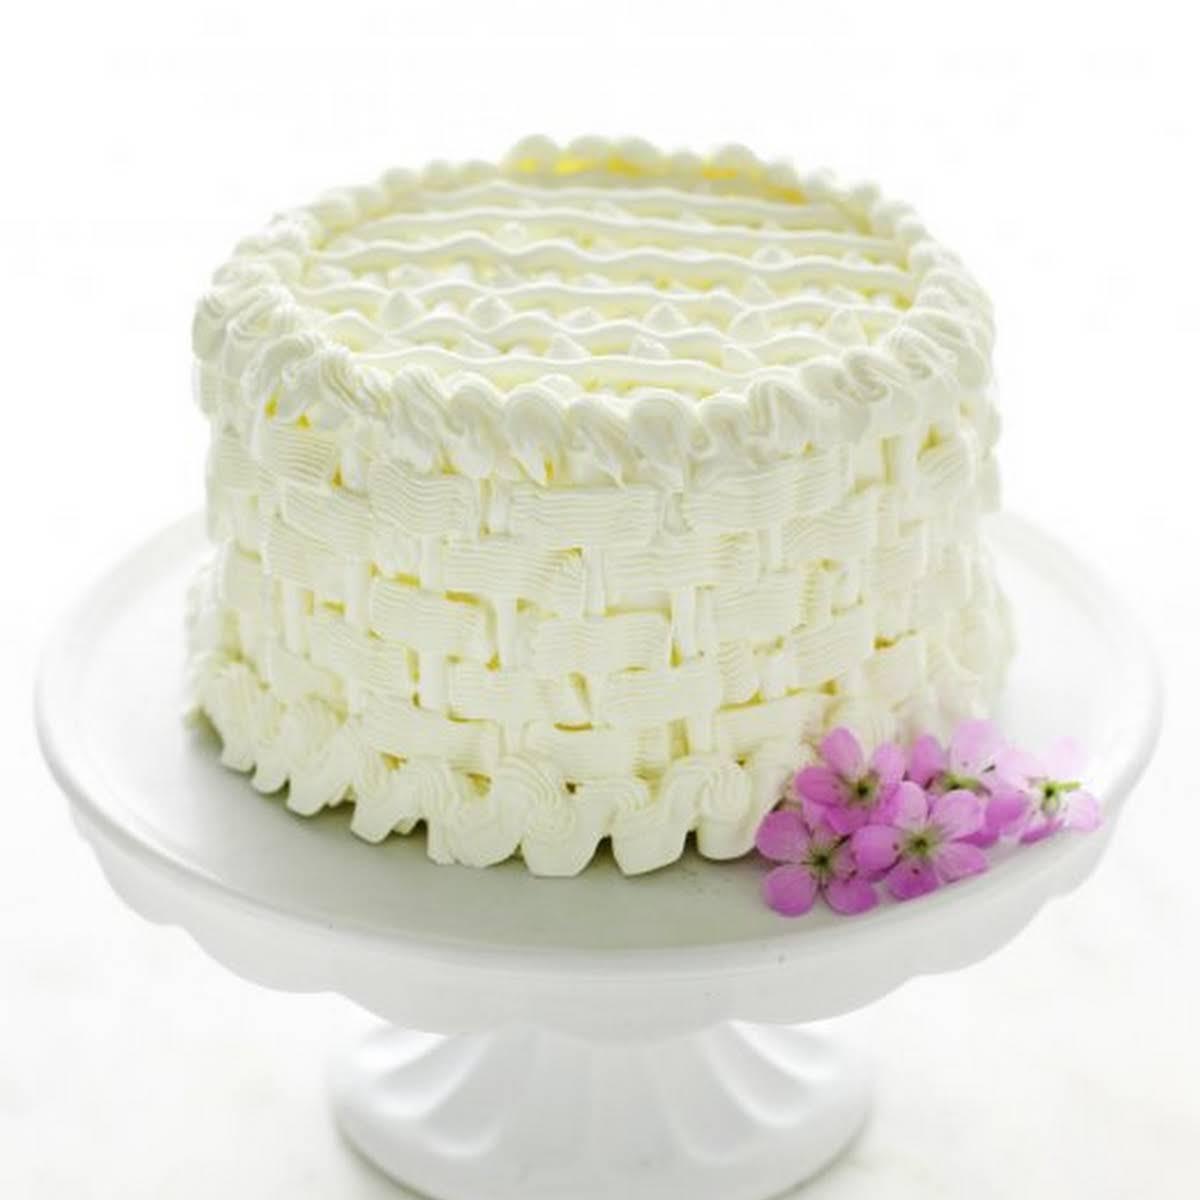 Enjoyable Orange Butter Cake Martha Stewart Recipes Yummly Funny Birthday Cards Online Overcheapnameinfo